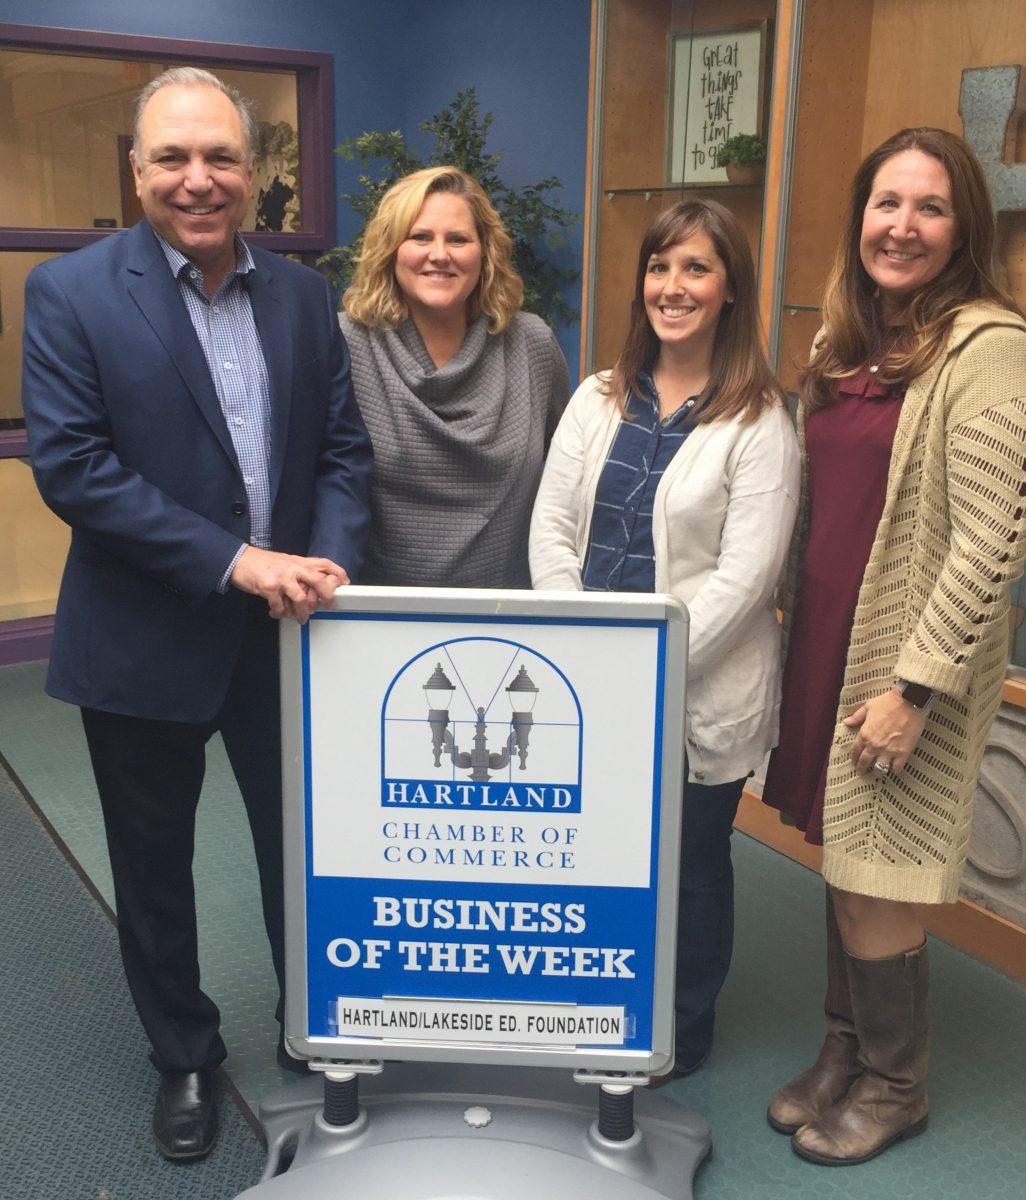 MEET HARTLAND CHAMBER BUSINESS OF THE WEEK – HARTLAND/LAKESIDE EDUCATION FOUNDATION